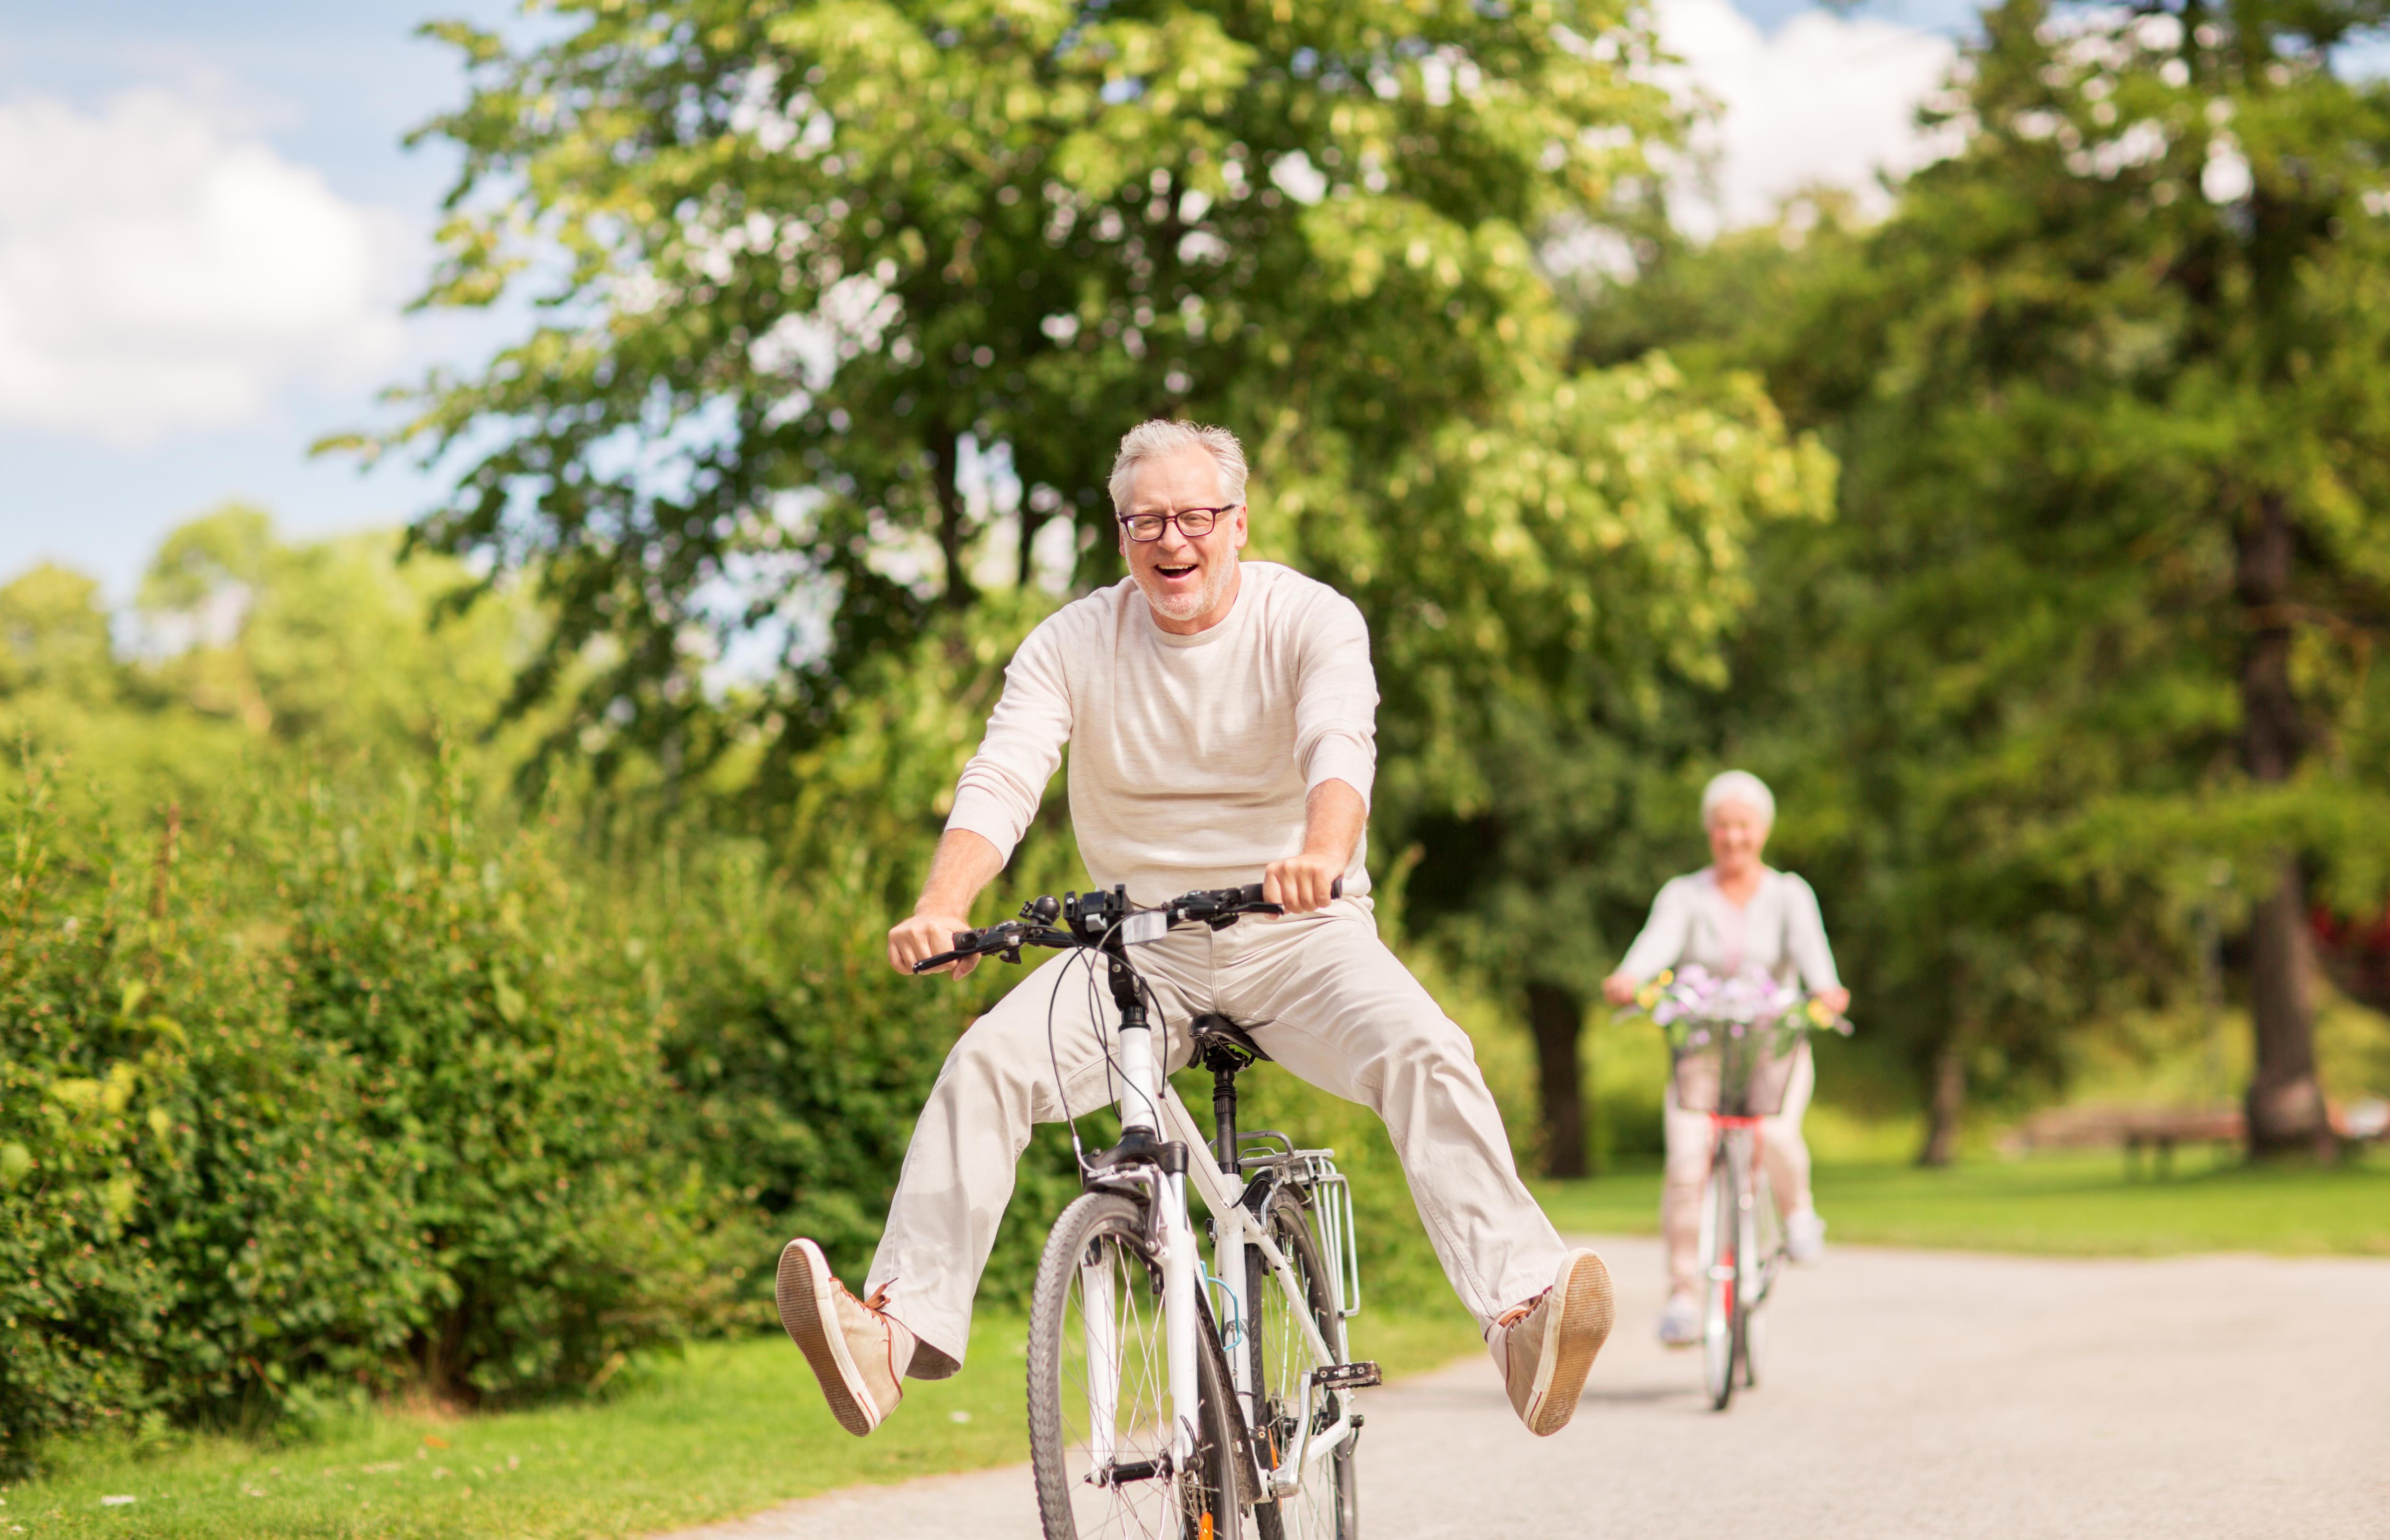 dementia elderly man woman cycle age